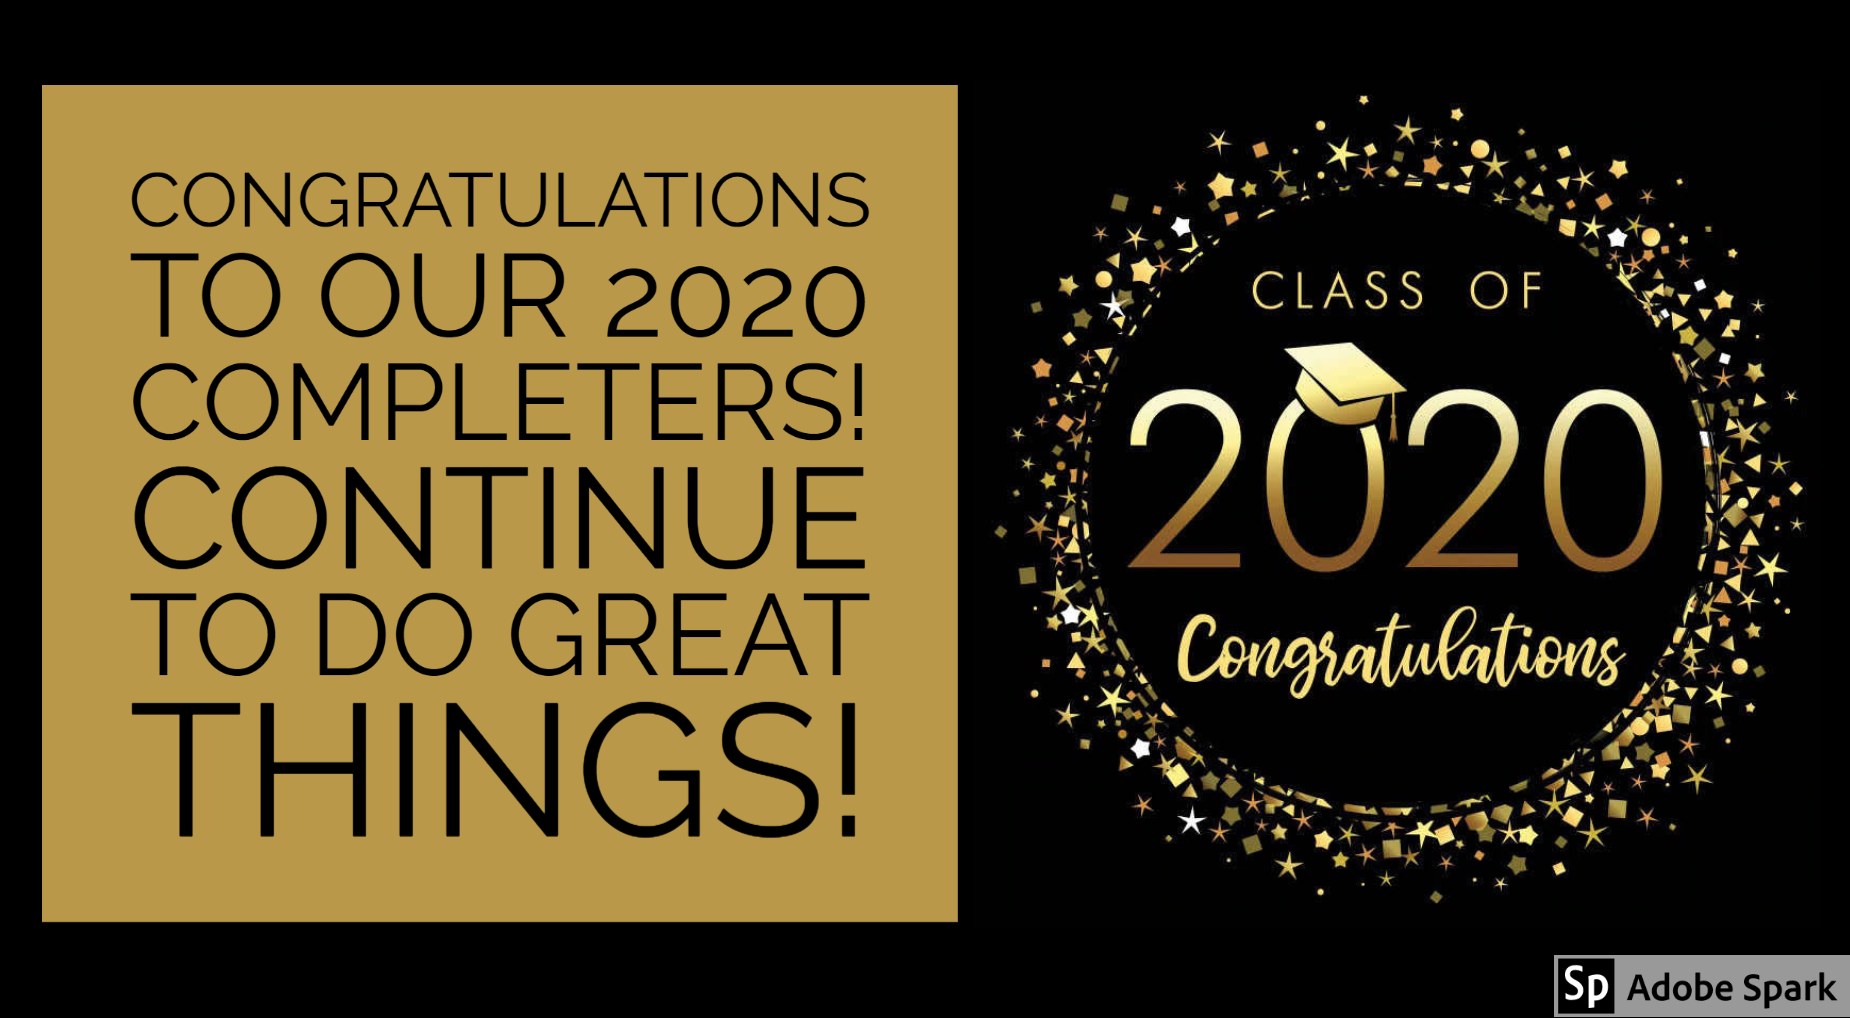 class of 2020, congratulations